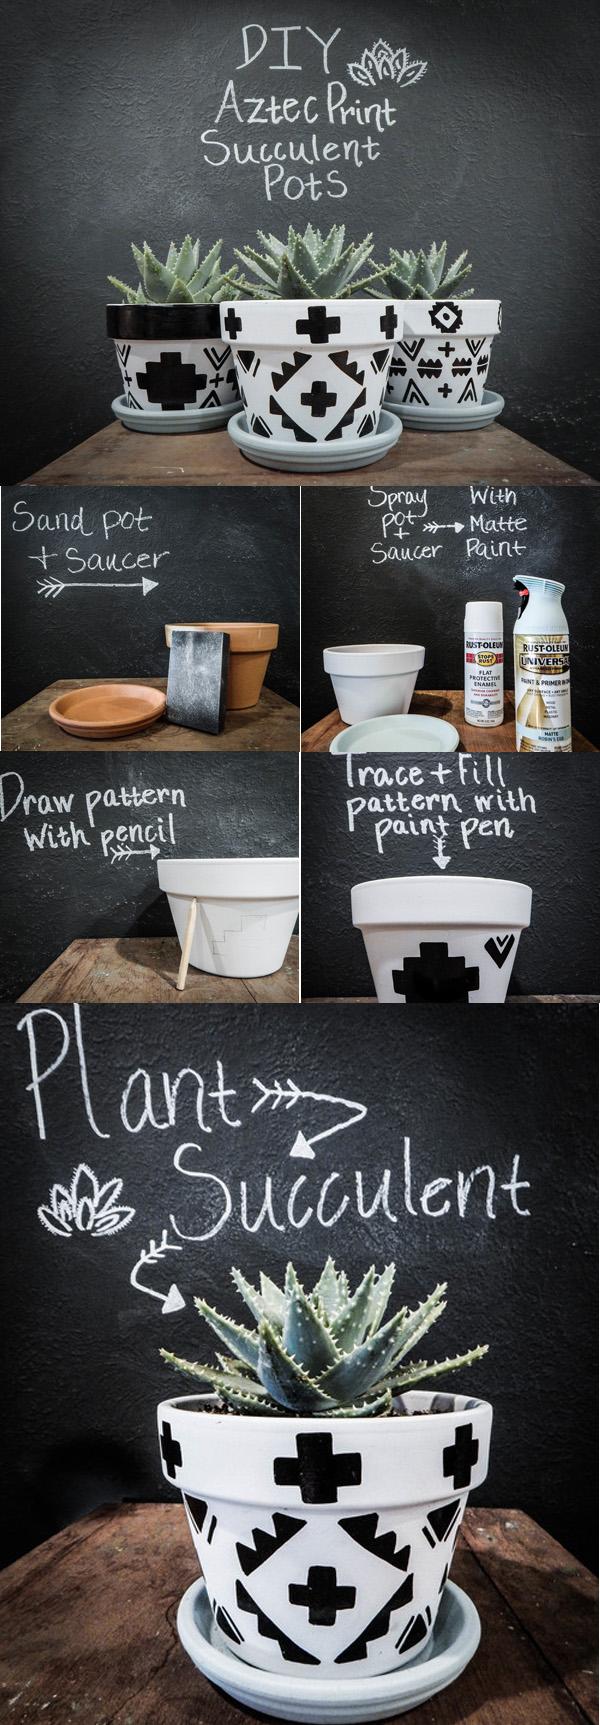 DIY ιδέες με γλάστρες16